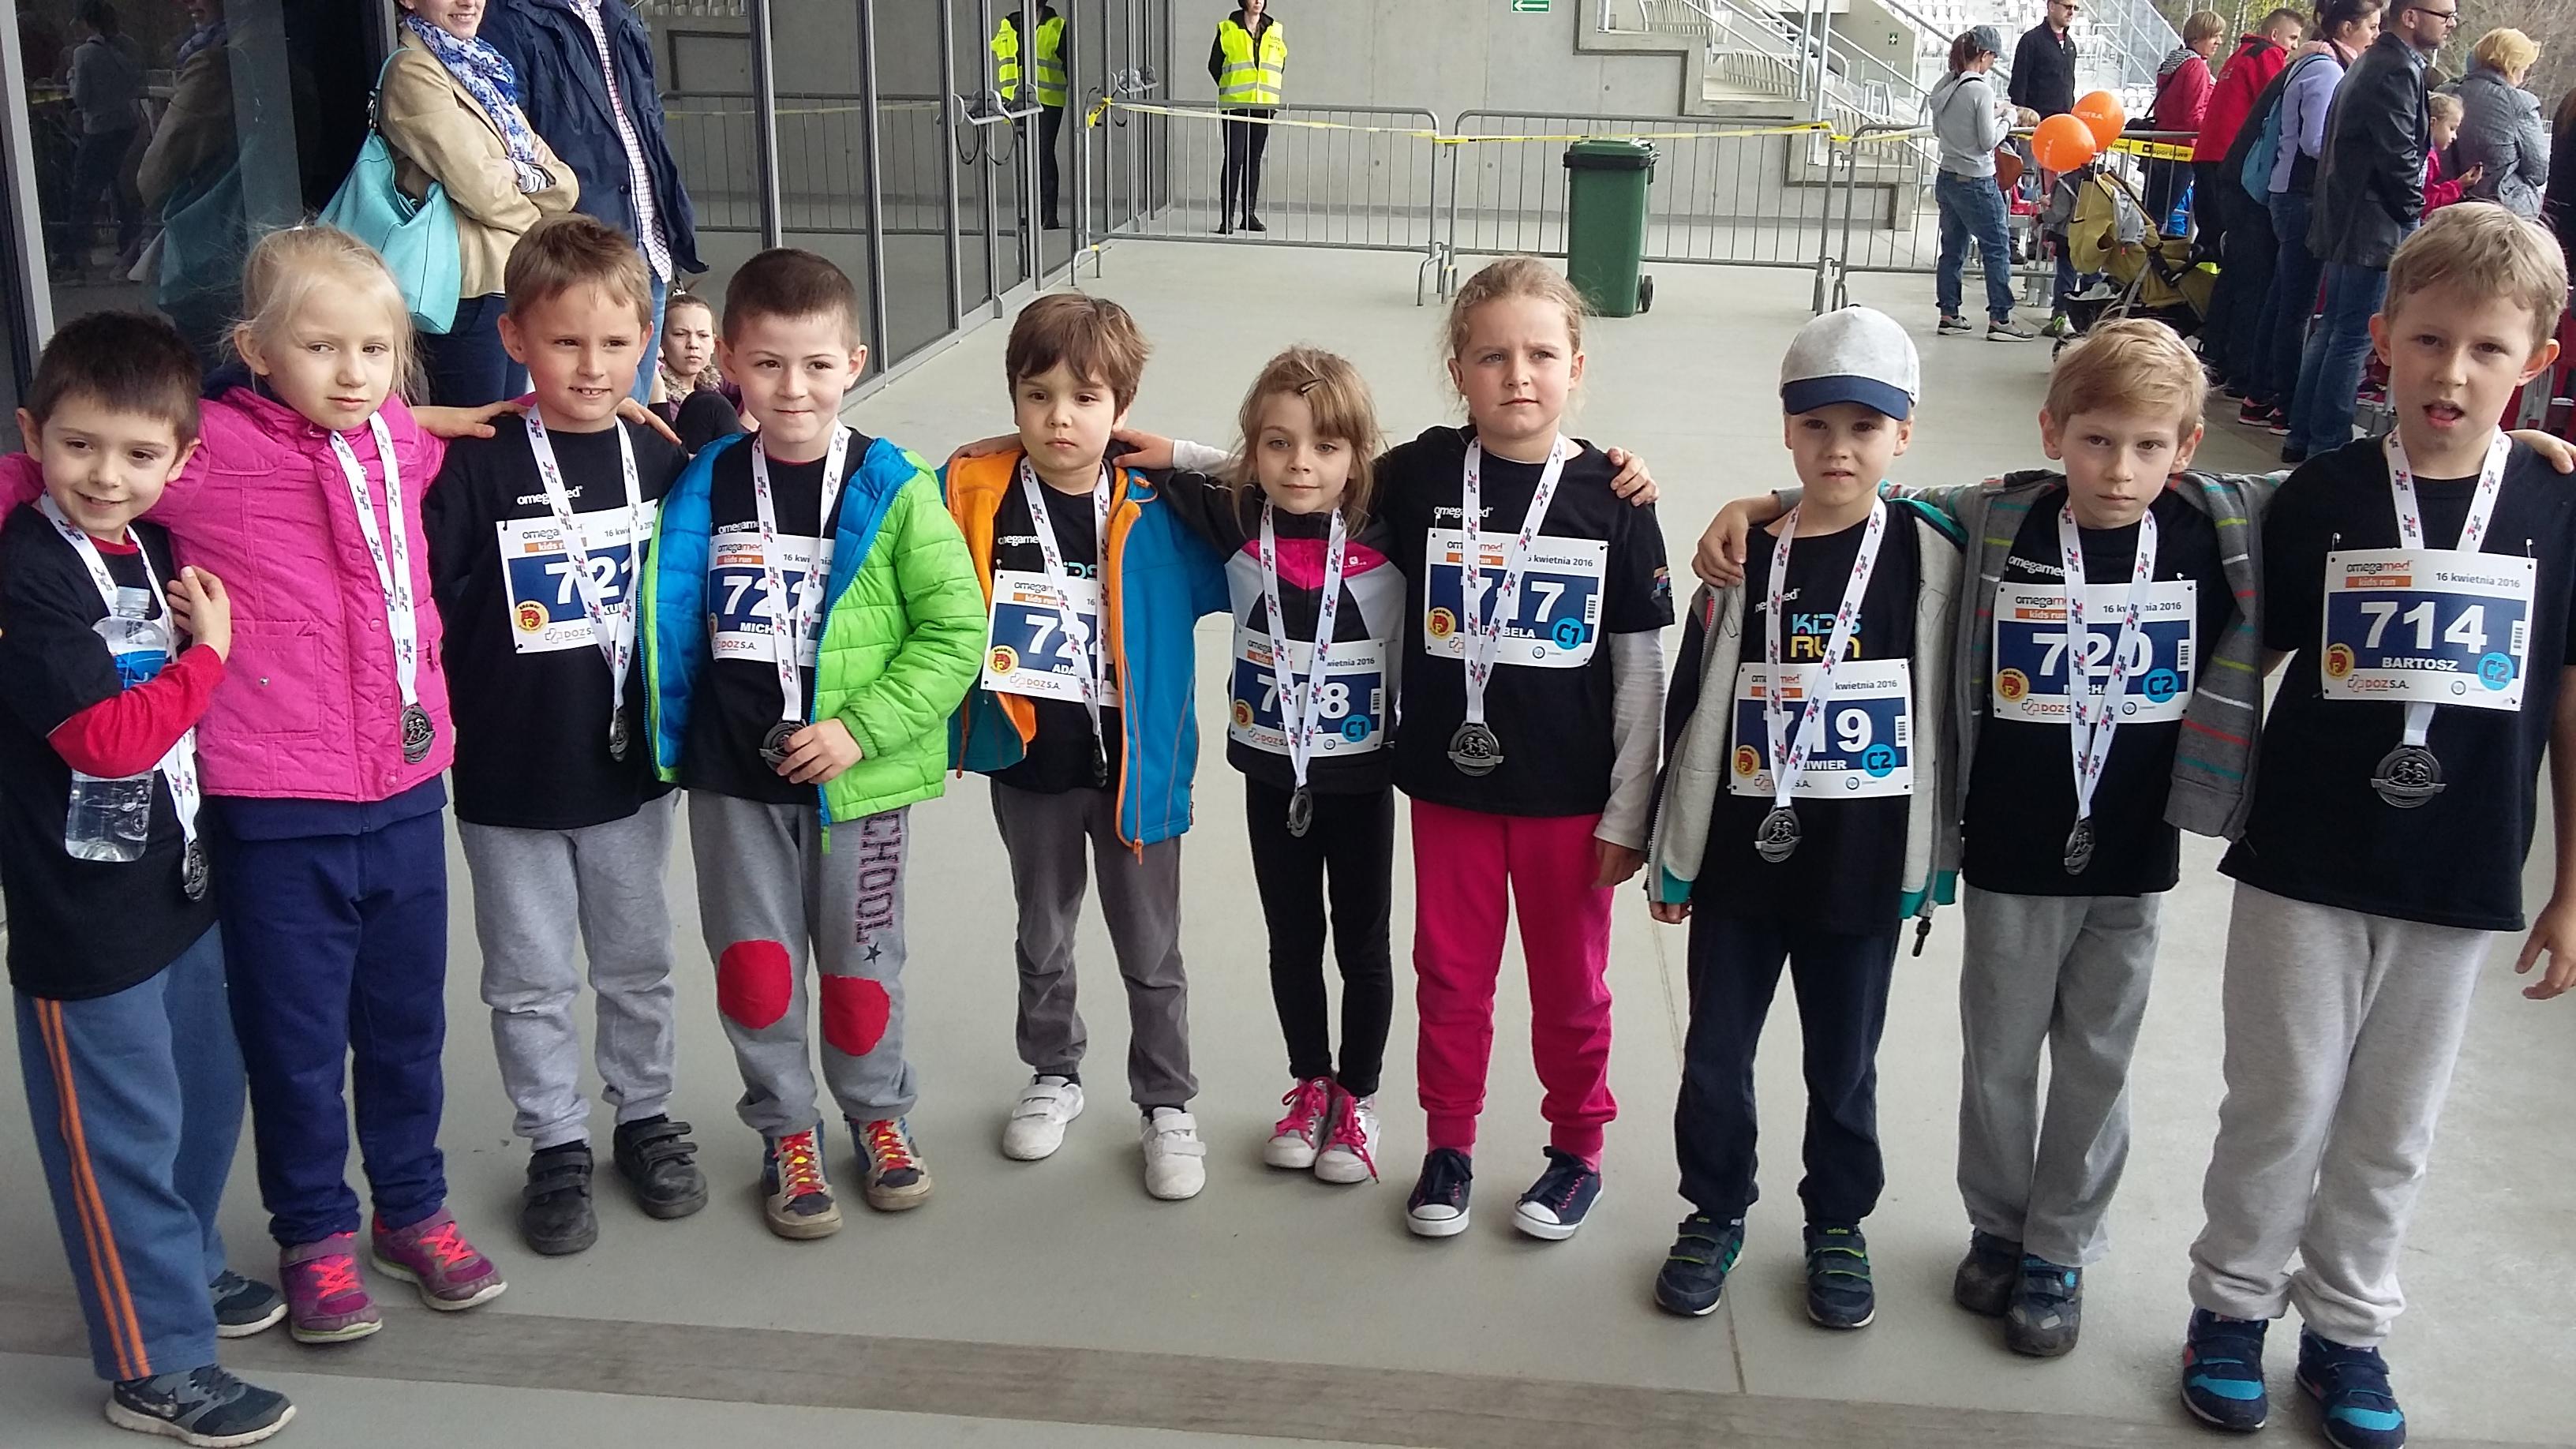 Kids Run 2016